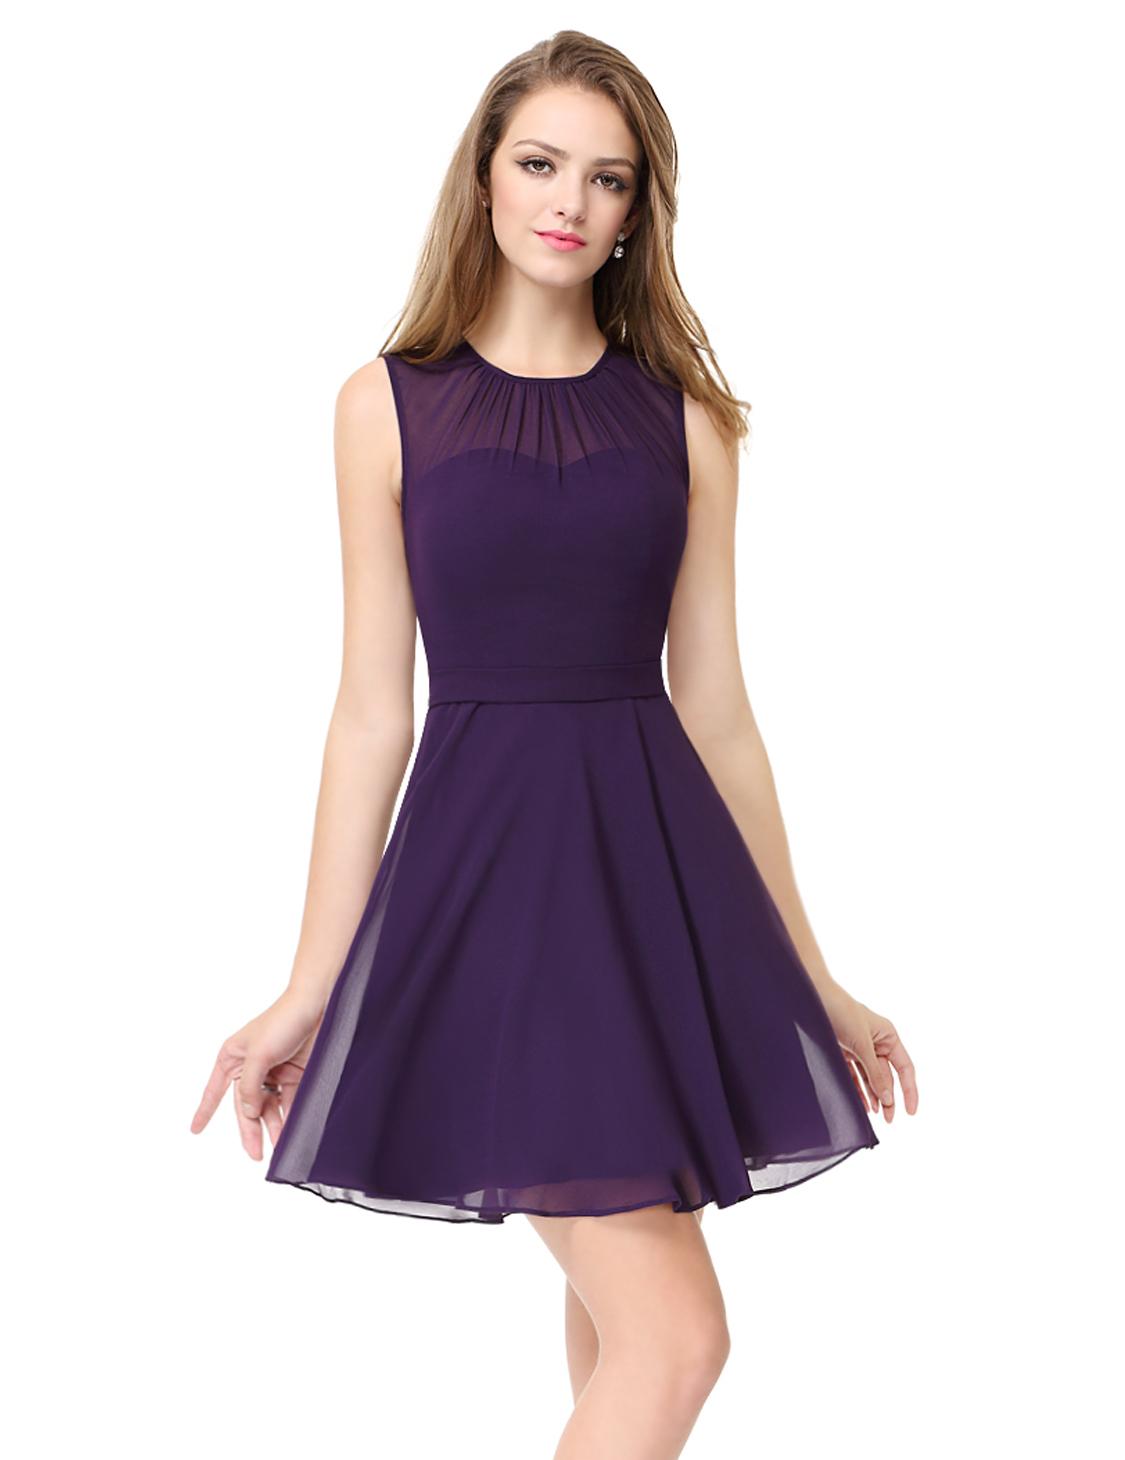 Alisa Pan Mini Sleeveless Casual Dresses Lace Round Neck Party Dresses 05253  eBay